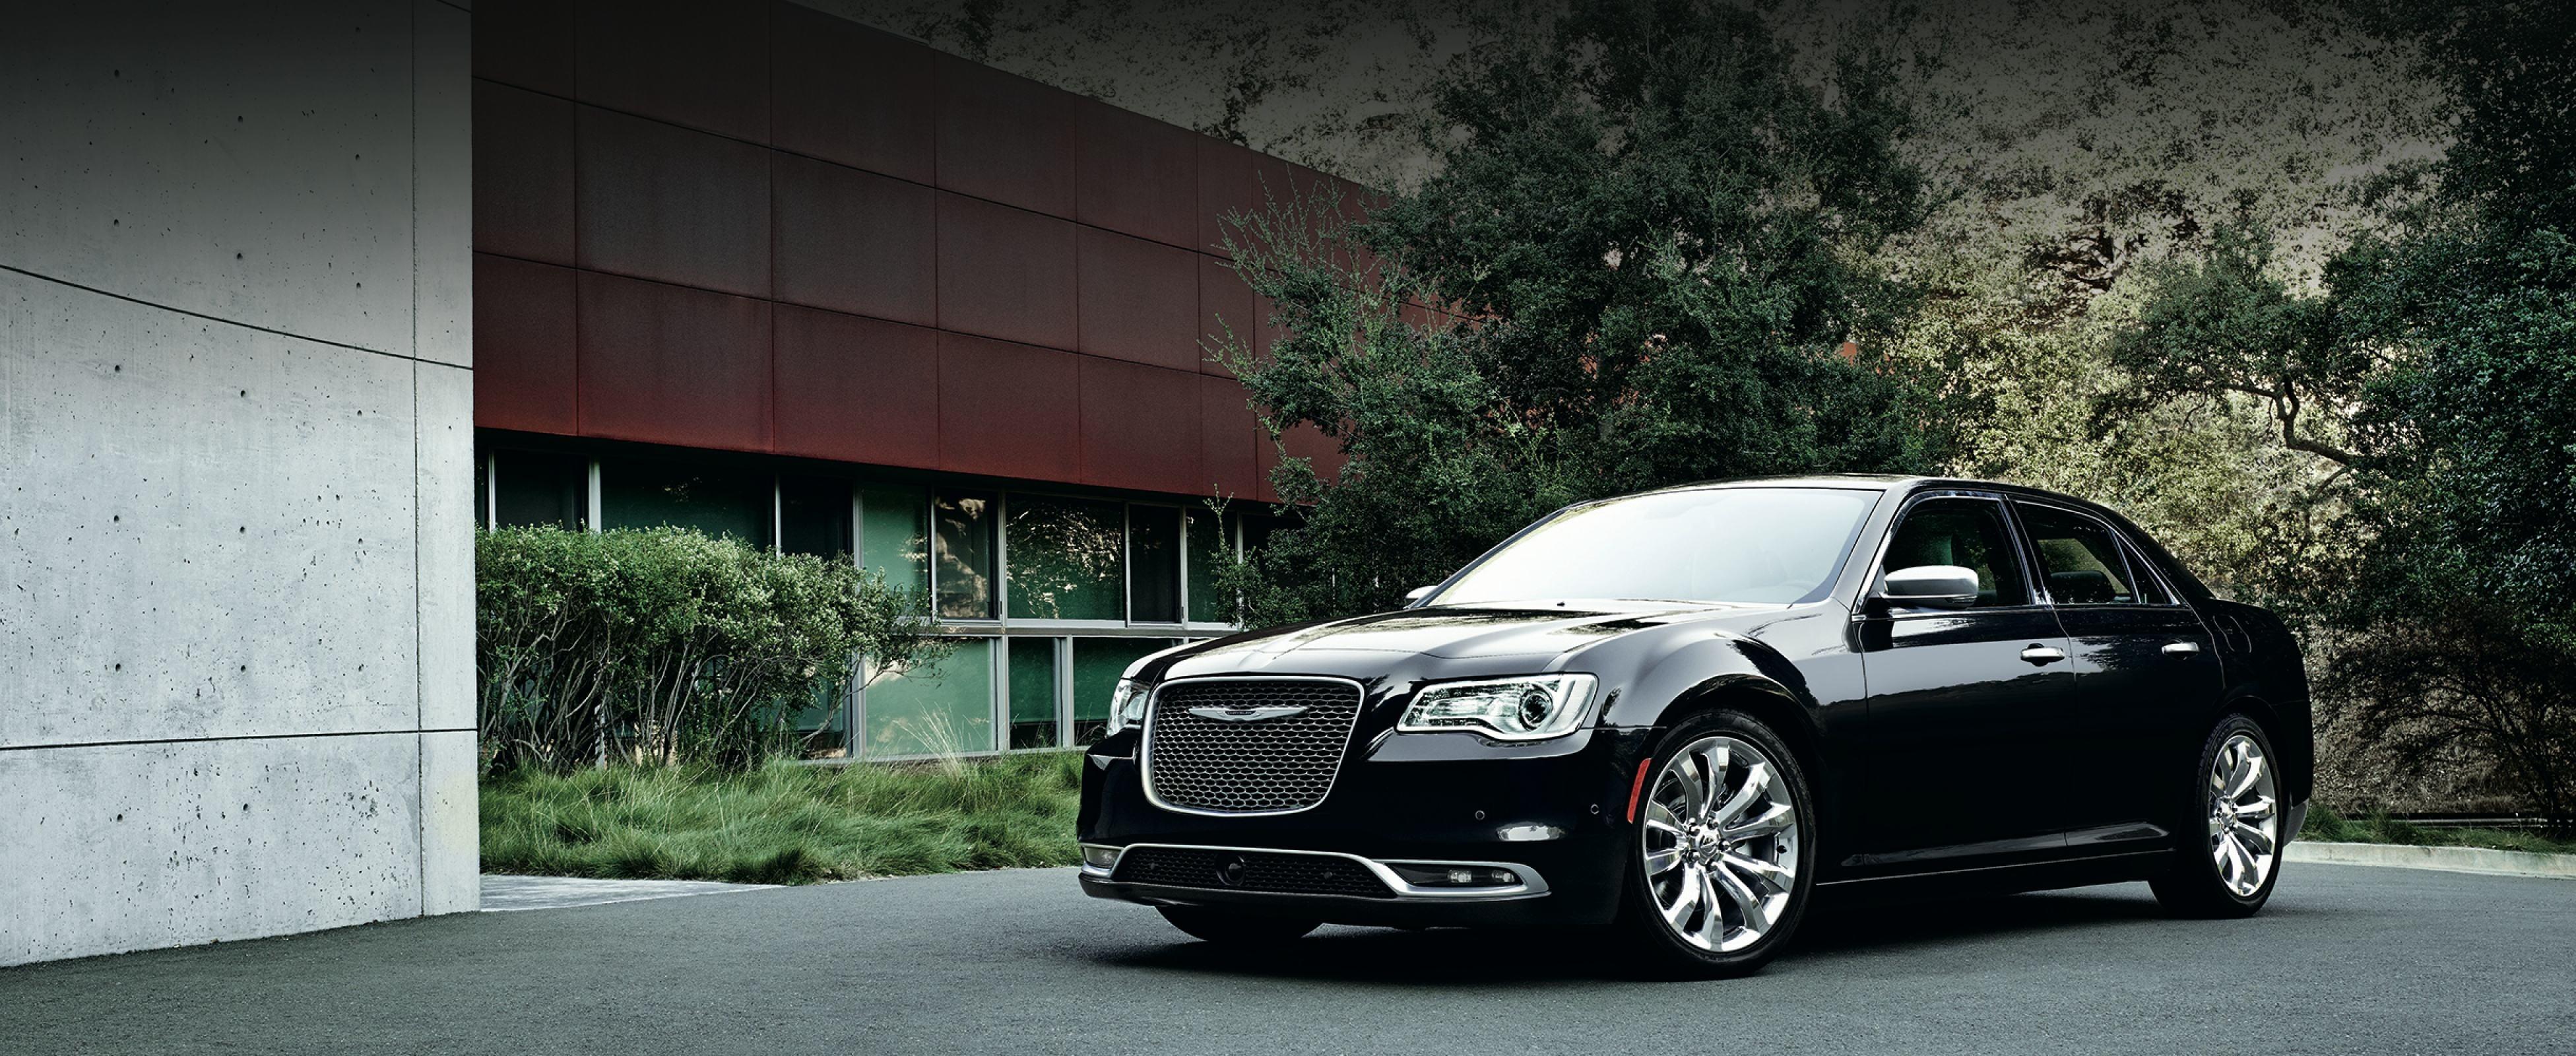 Chrysler 300 Ltd 3 6l Or Similar Luxury Car Rental Budget Car Rental